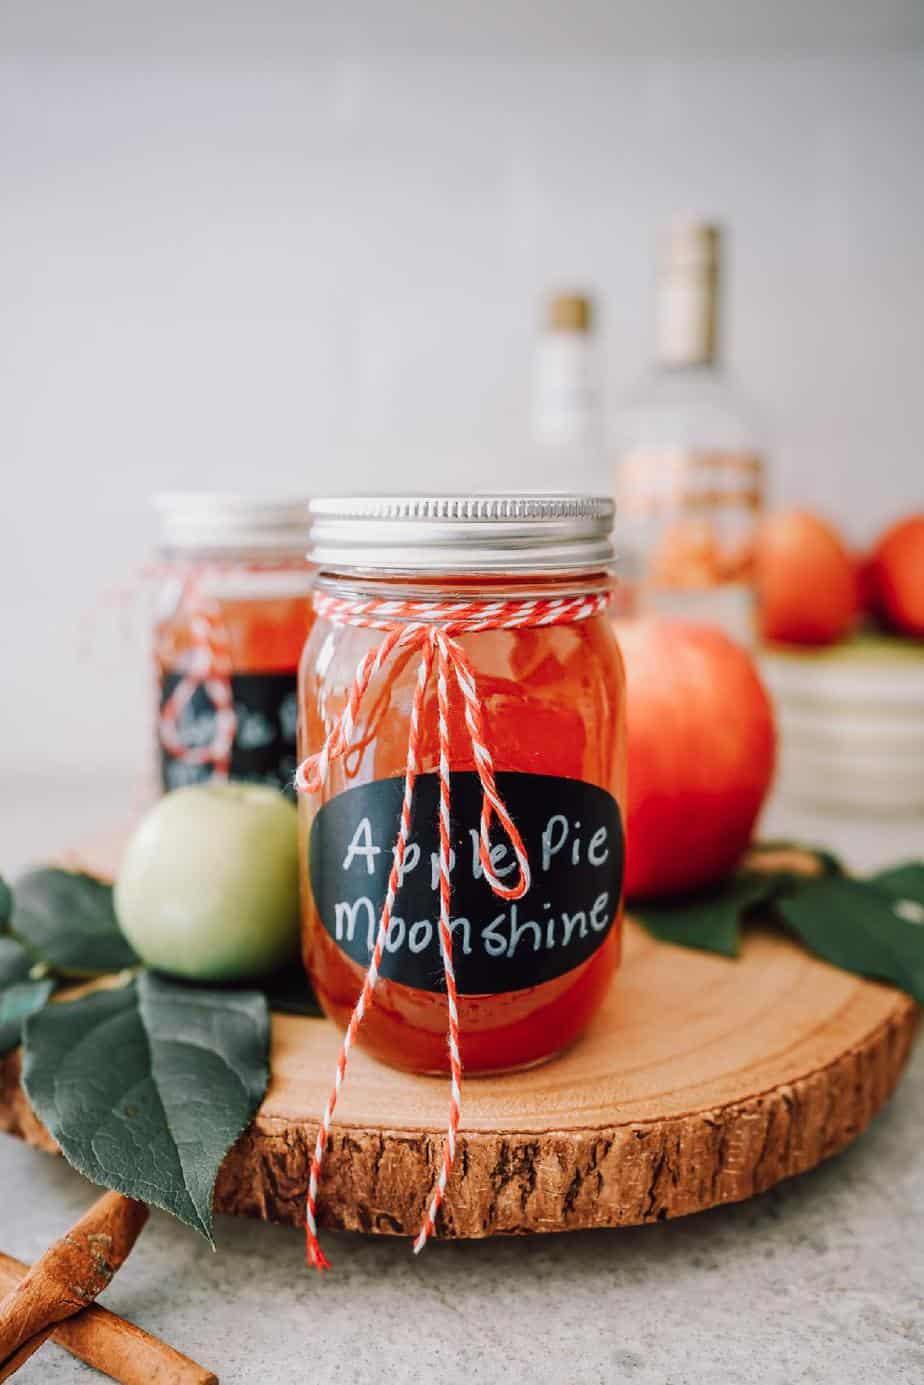 apple, apples, apple pie, apple pie moonshine, moonshine, alcohol, drink, martini, instant pot, Ninja Foodi, beverage, cocktails, vodka, ever clear